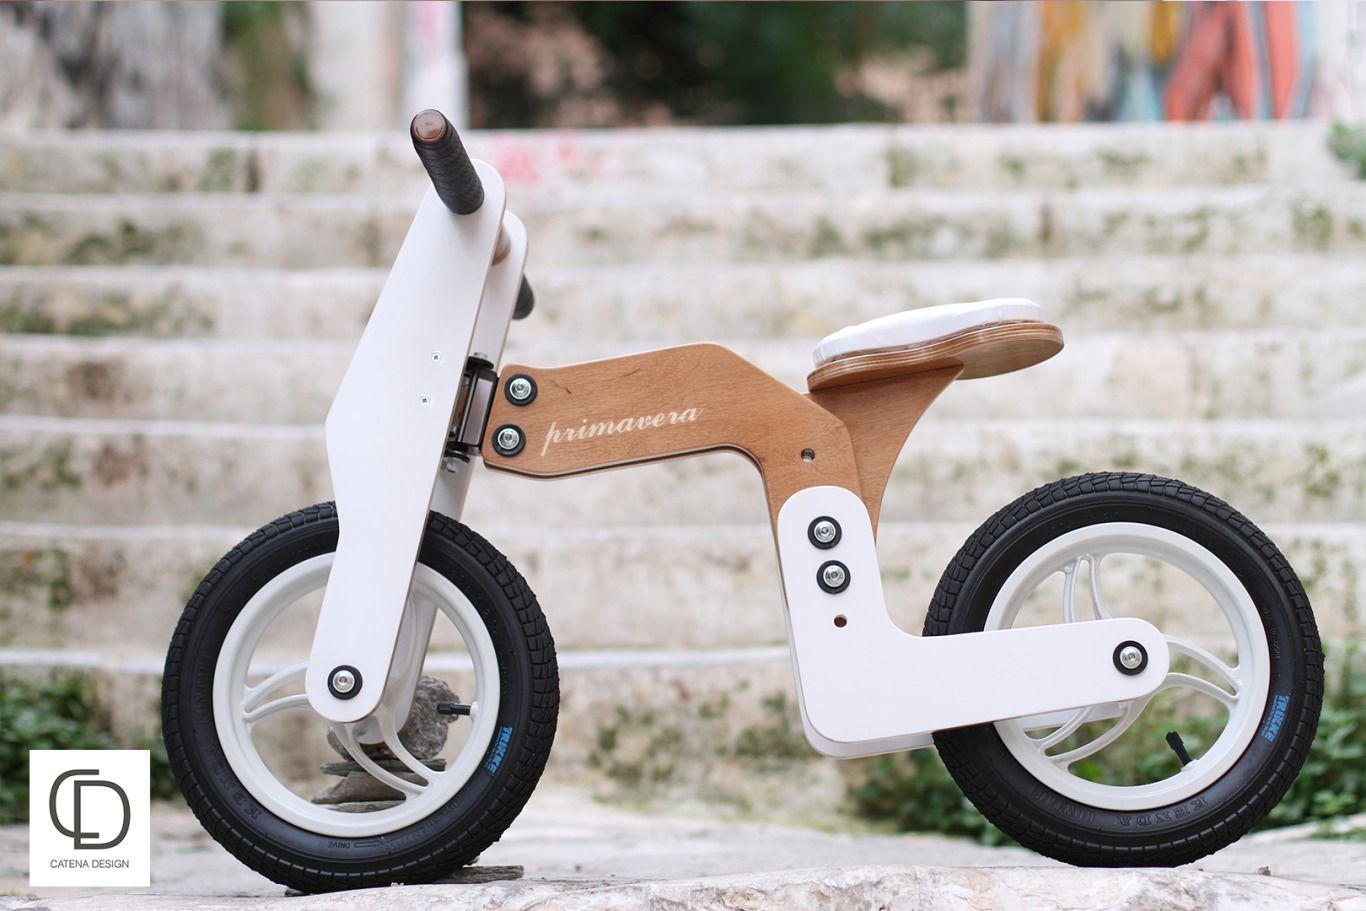 Primavera Balance Bike Woodworking Projects Diy Woodworking